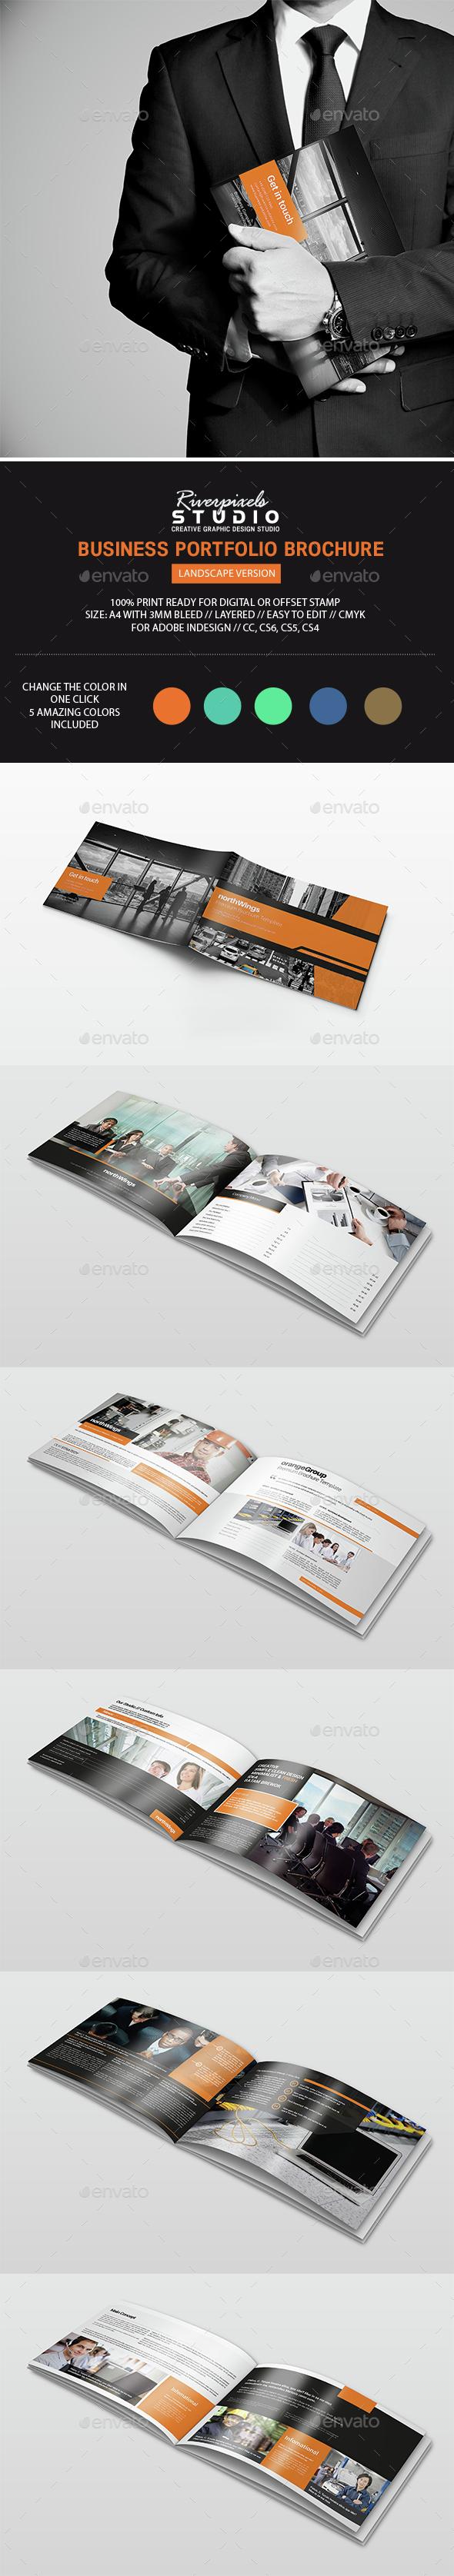 Business Portfolio Landscape Edition - Portfolio Brochures